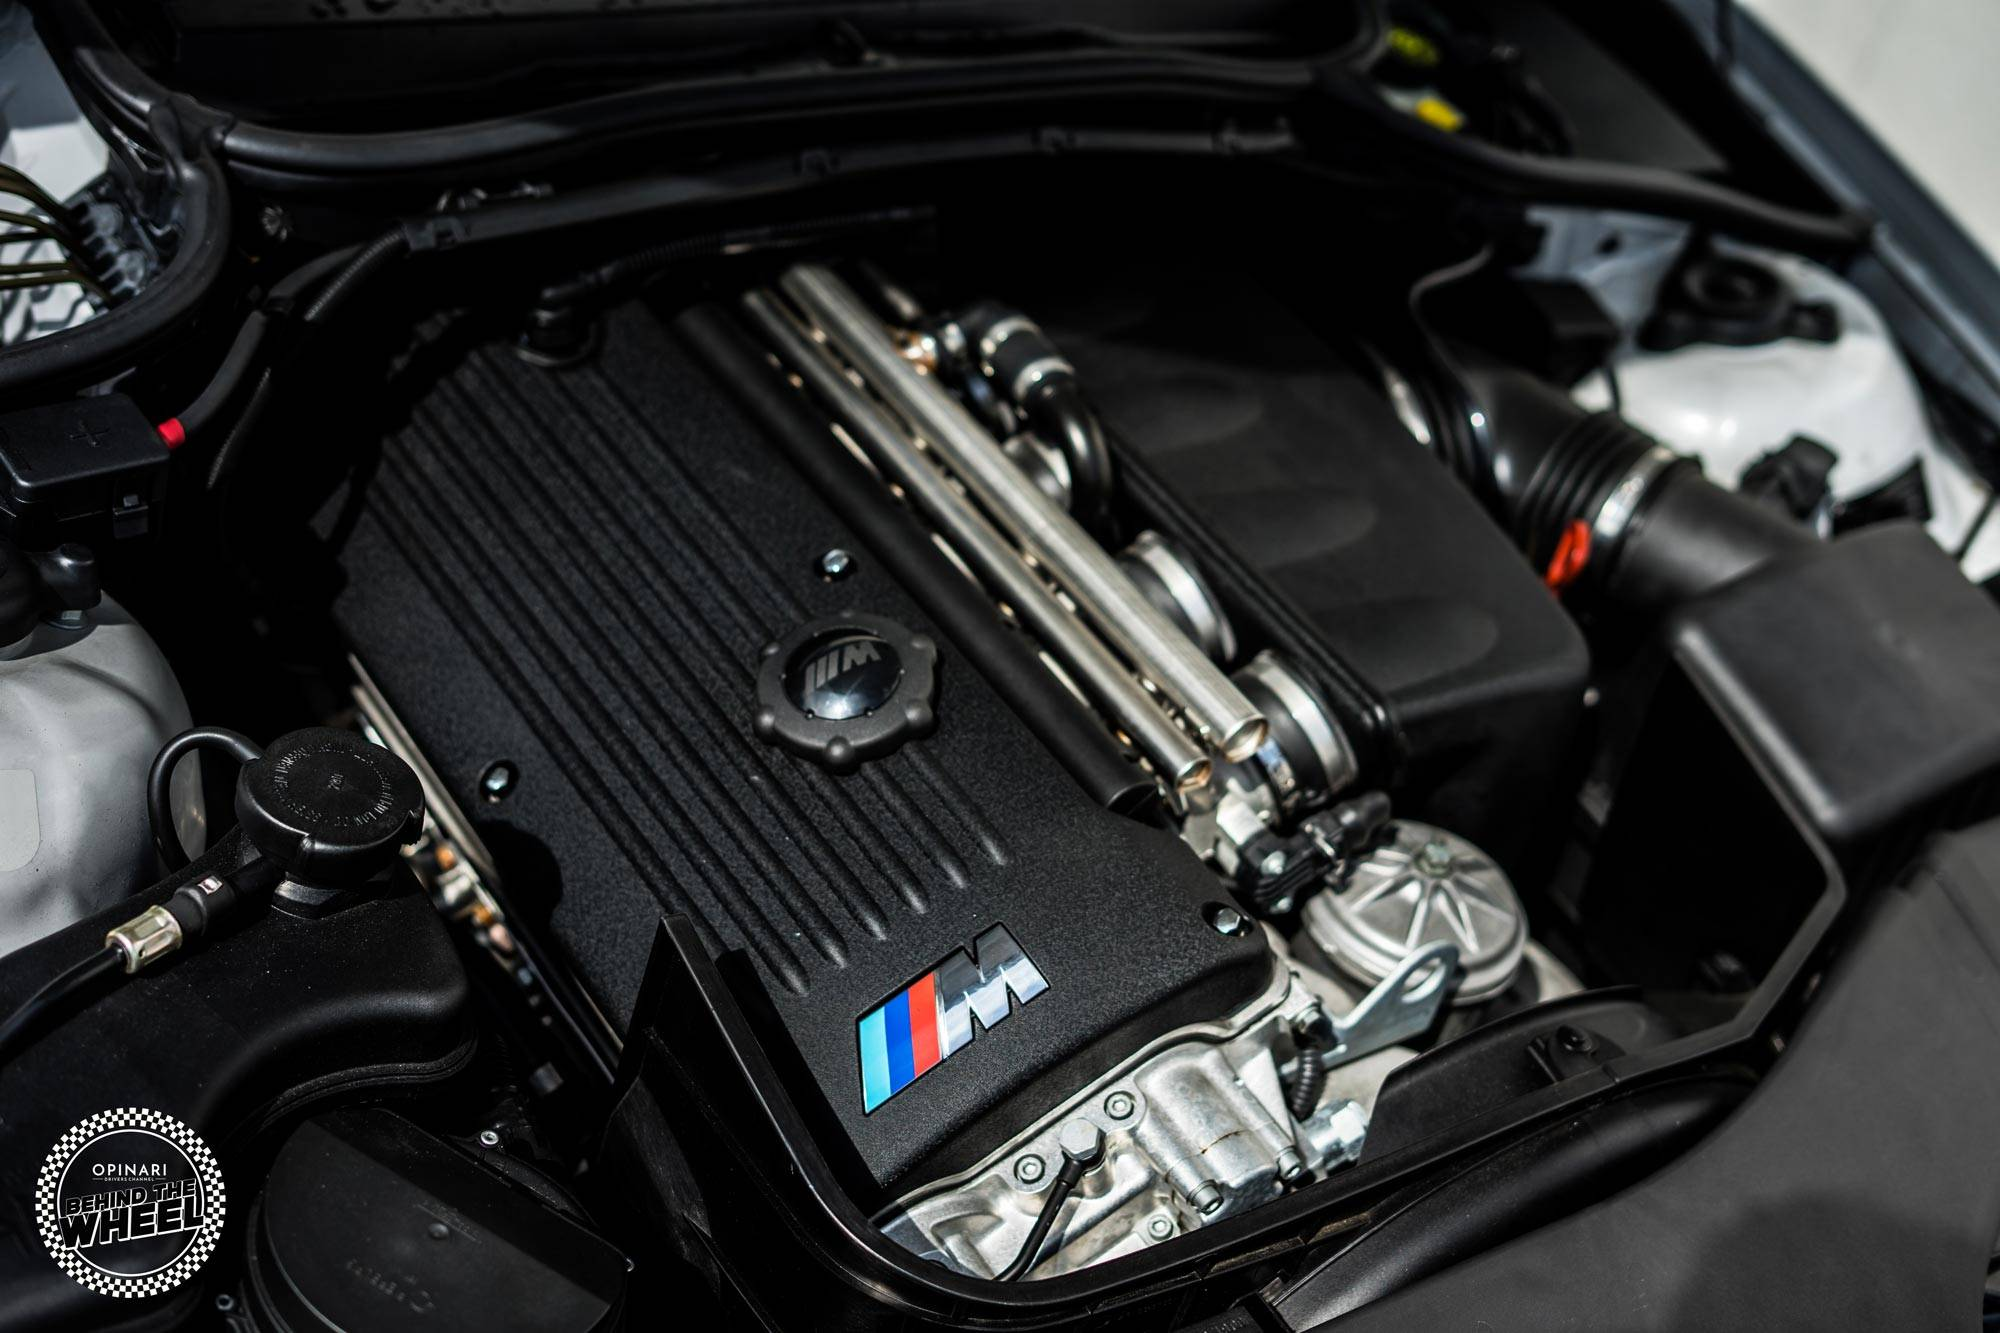 BMW M3 E46 straight-six